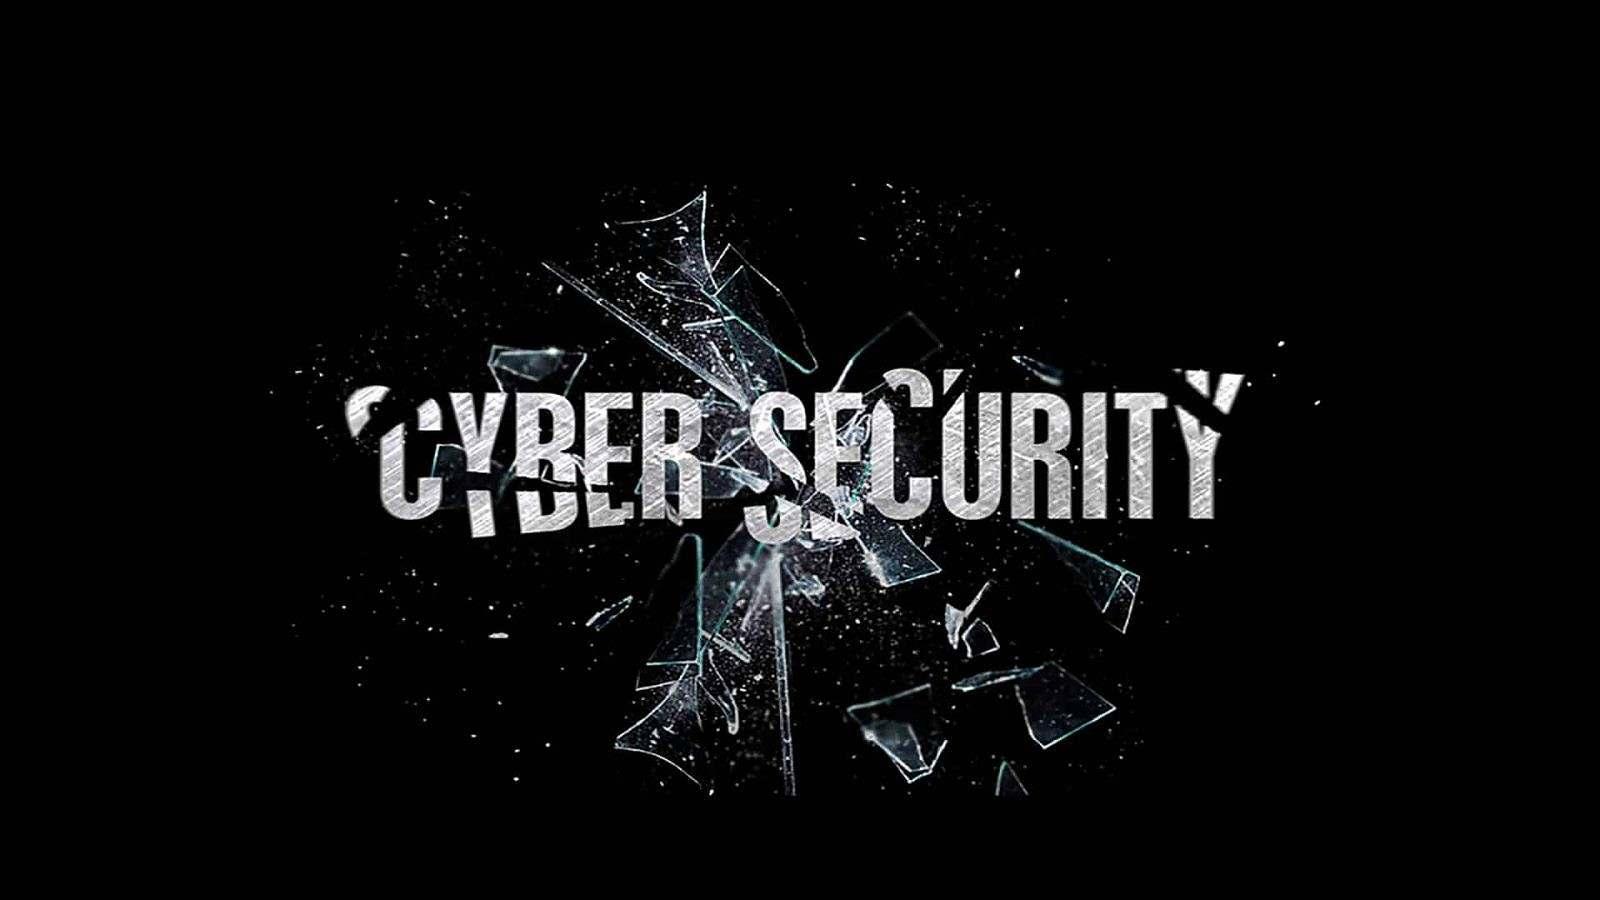 Click Fraud Gateways: Phishing Emails and Botnet Malware